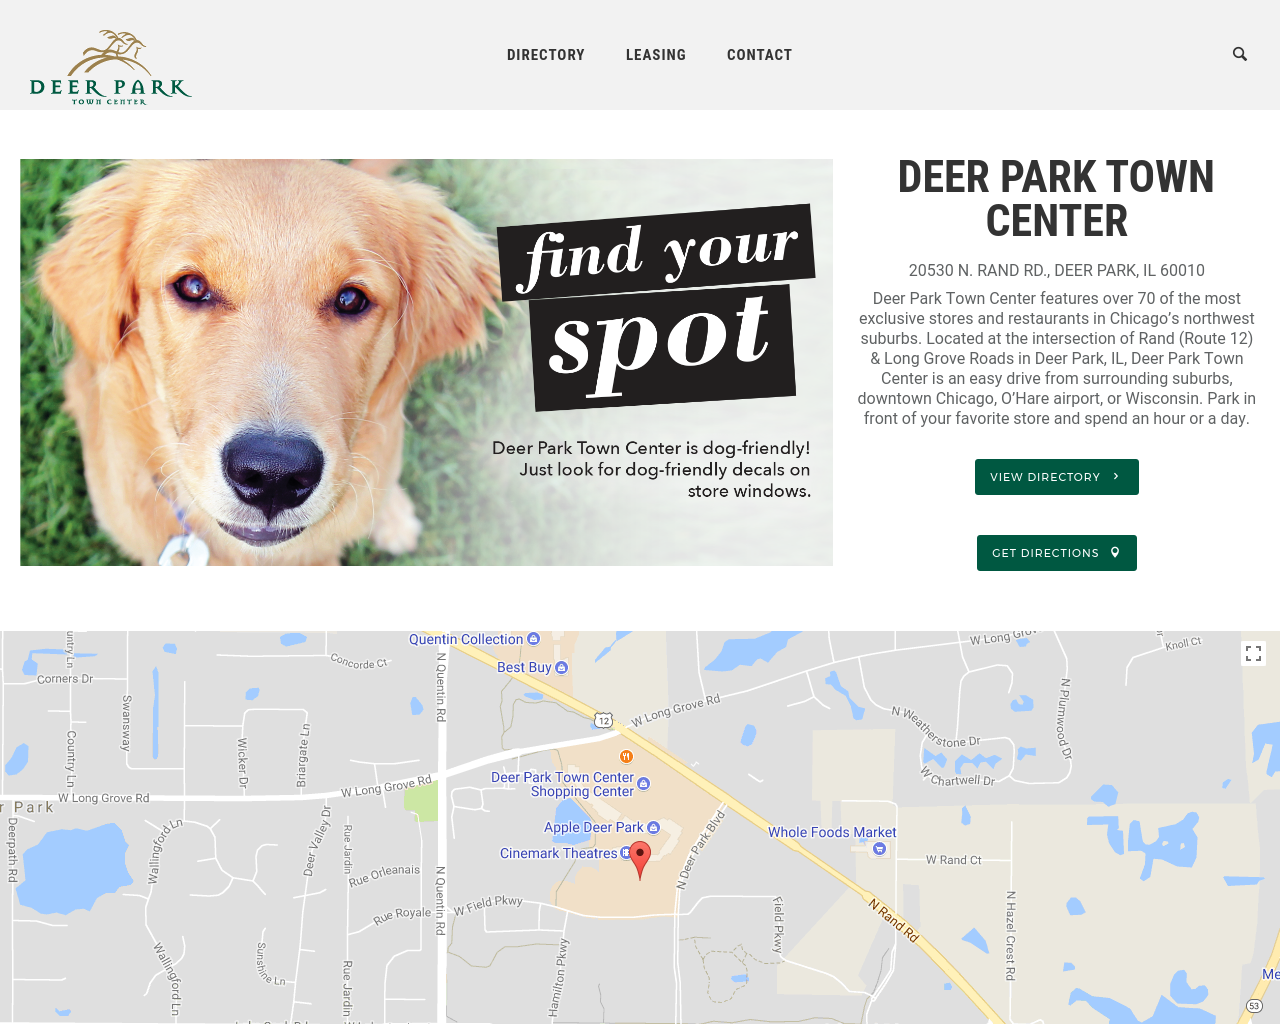 Deer-Park-Town-Center-Advertising-Reviews-Pricing